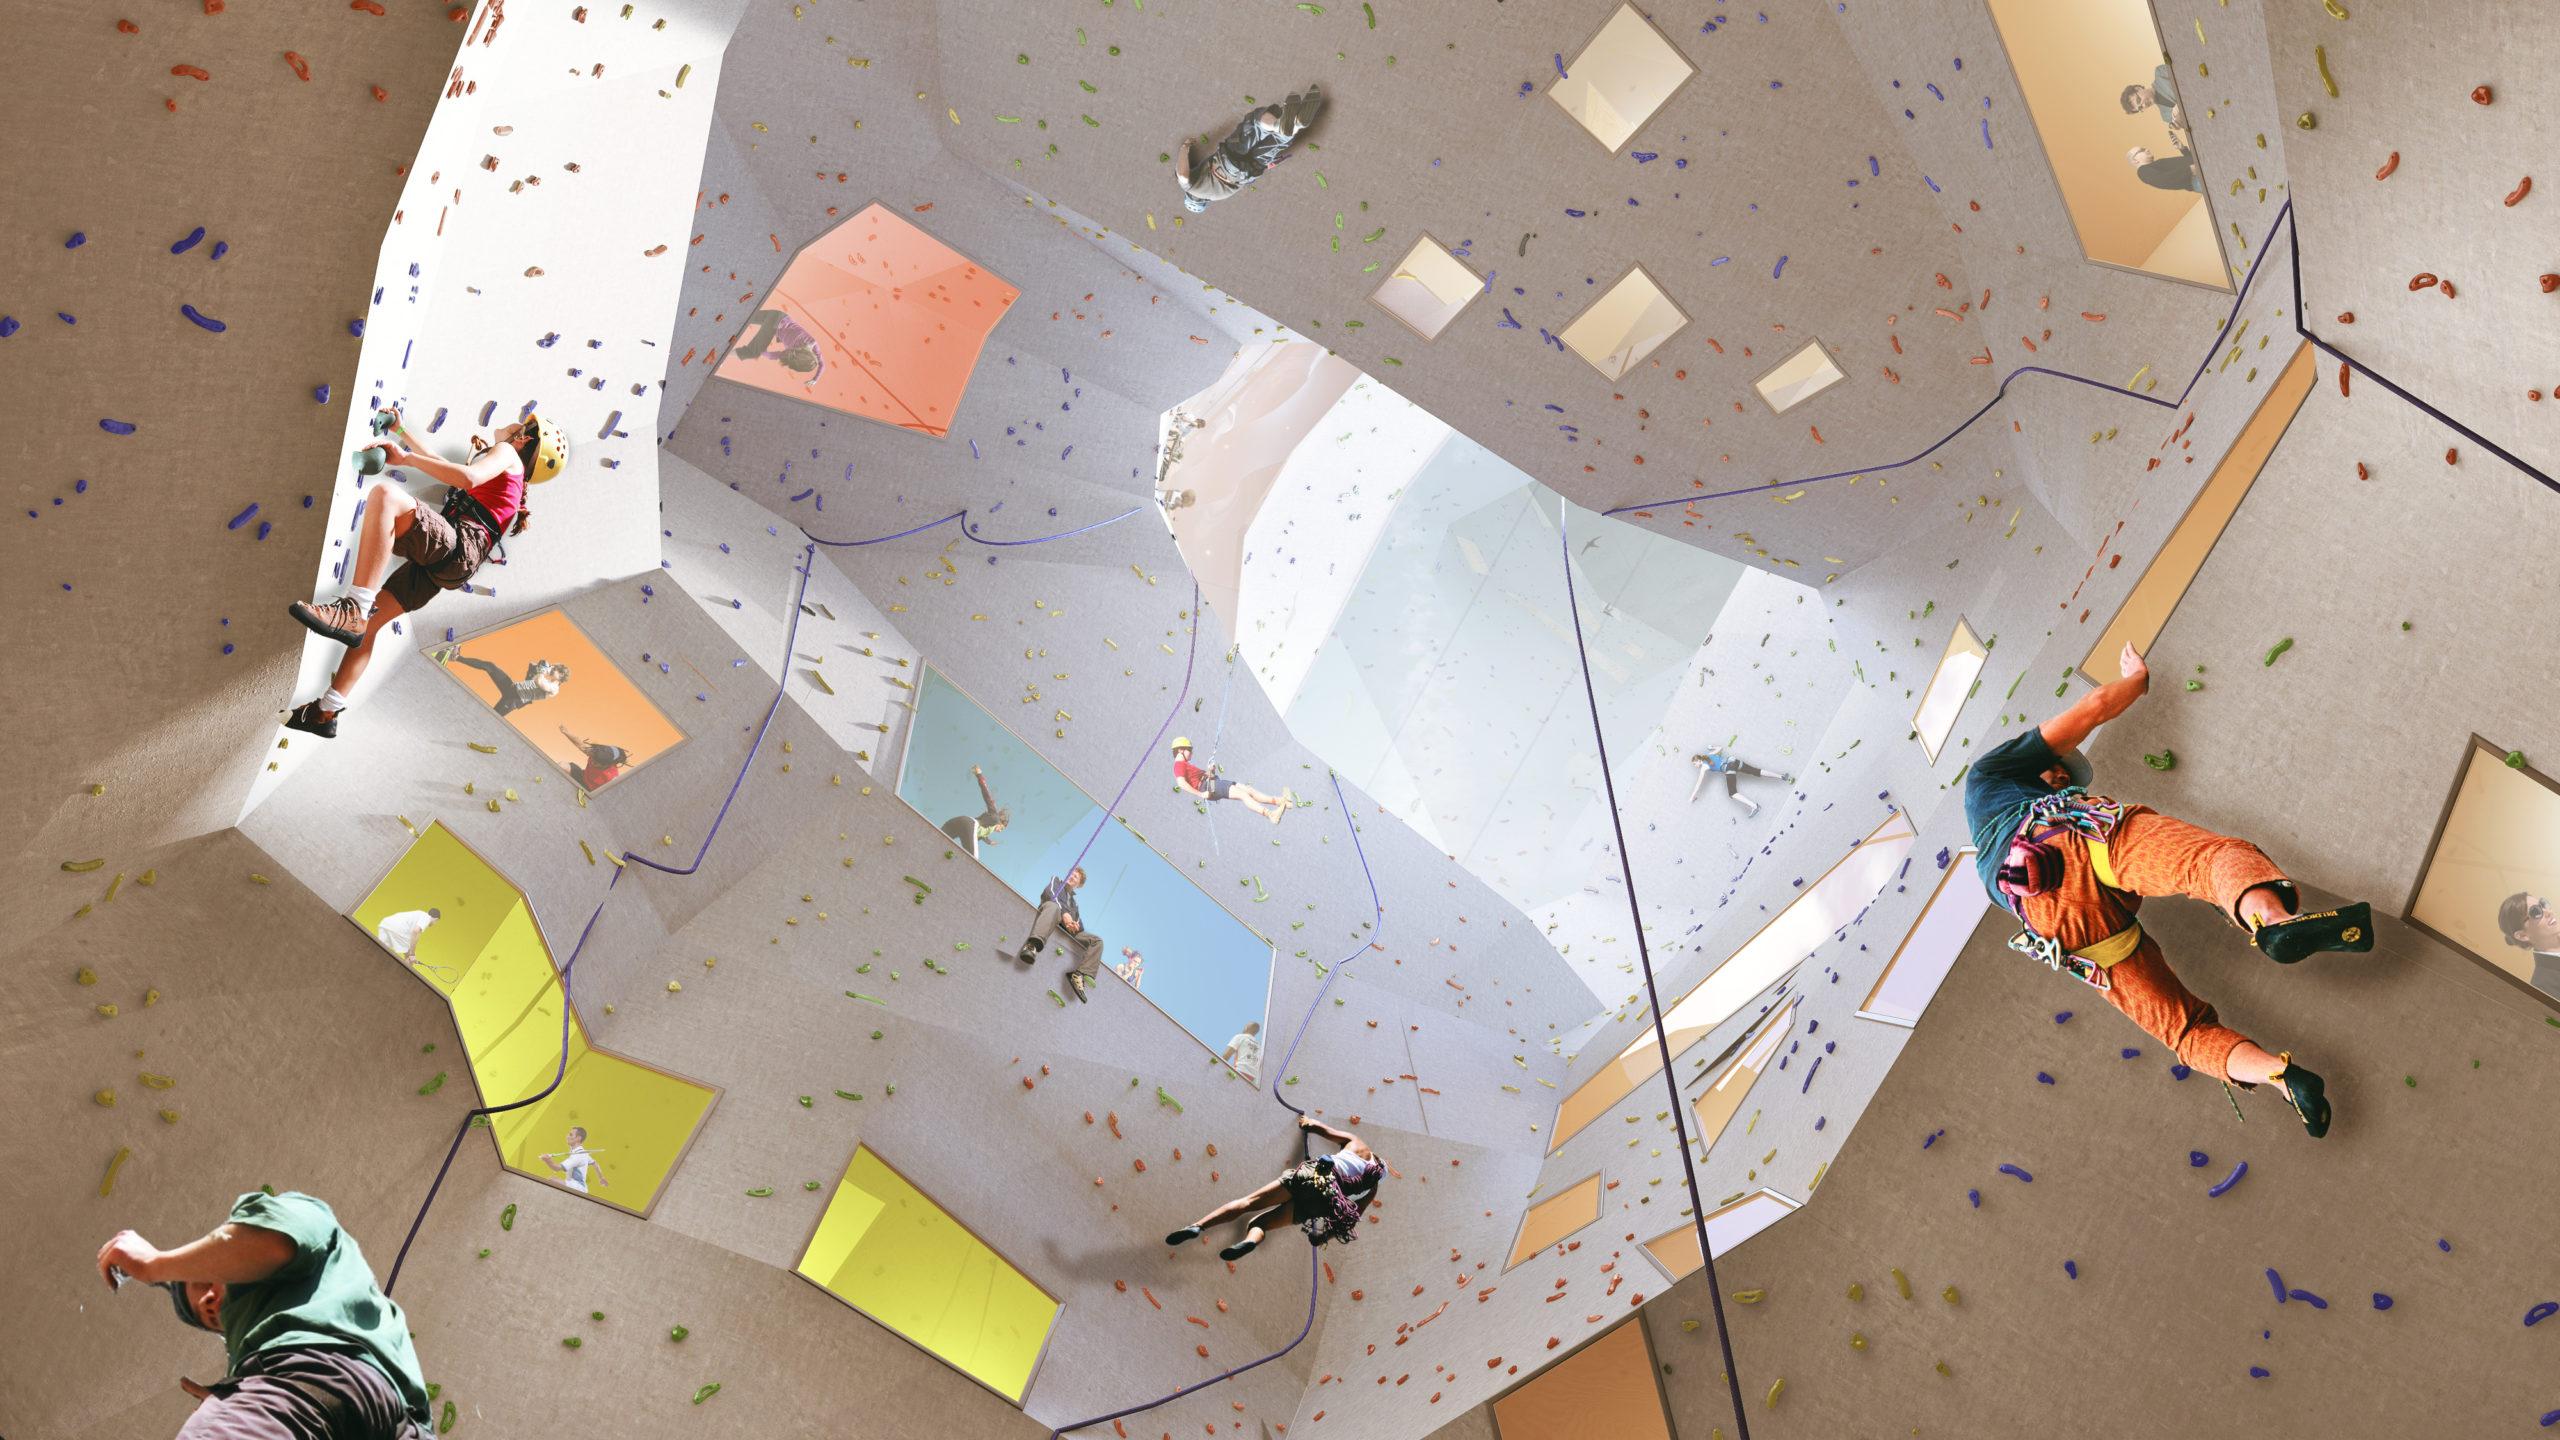 O-16-49-ICADE-EURALILLE-10.6-climbing-v03-scaled.jpg